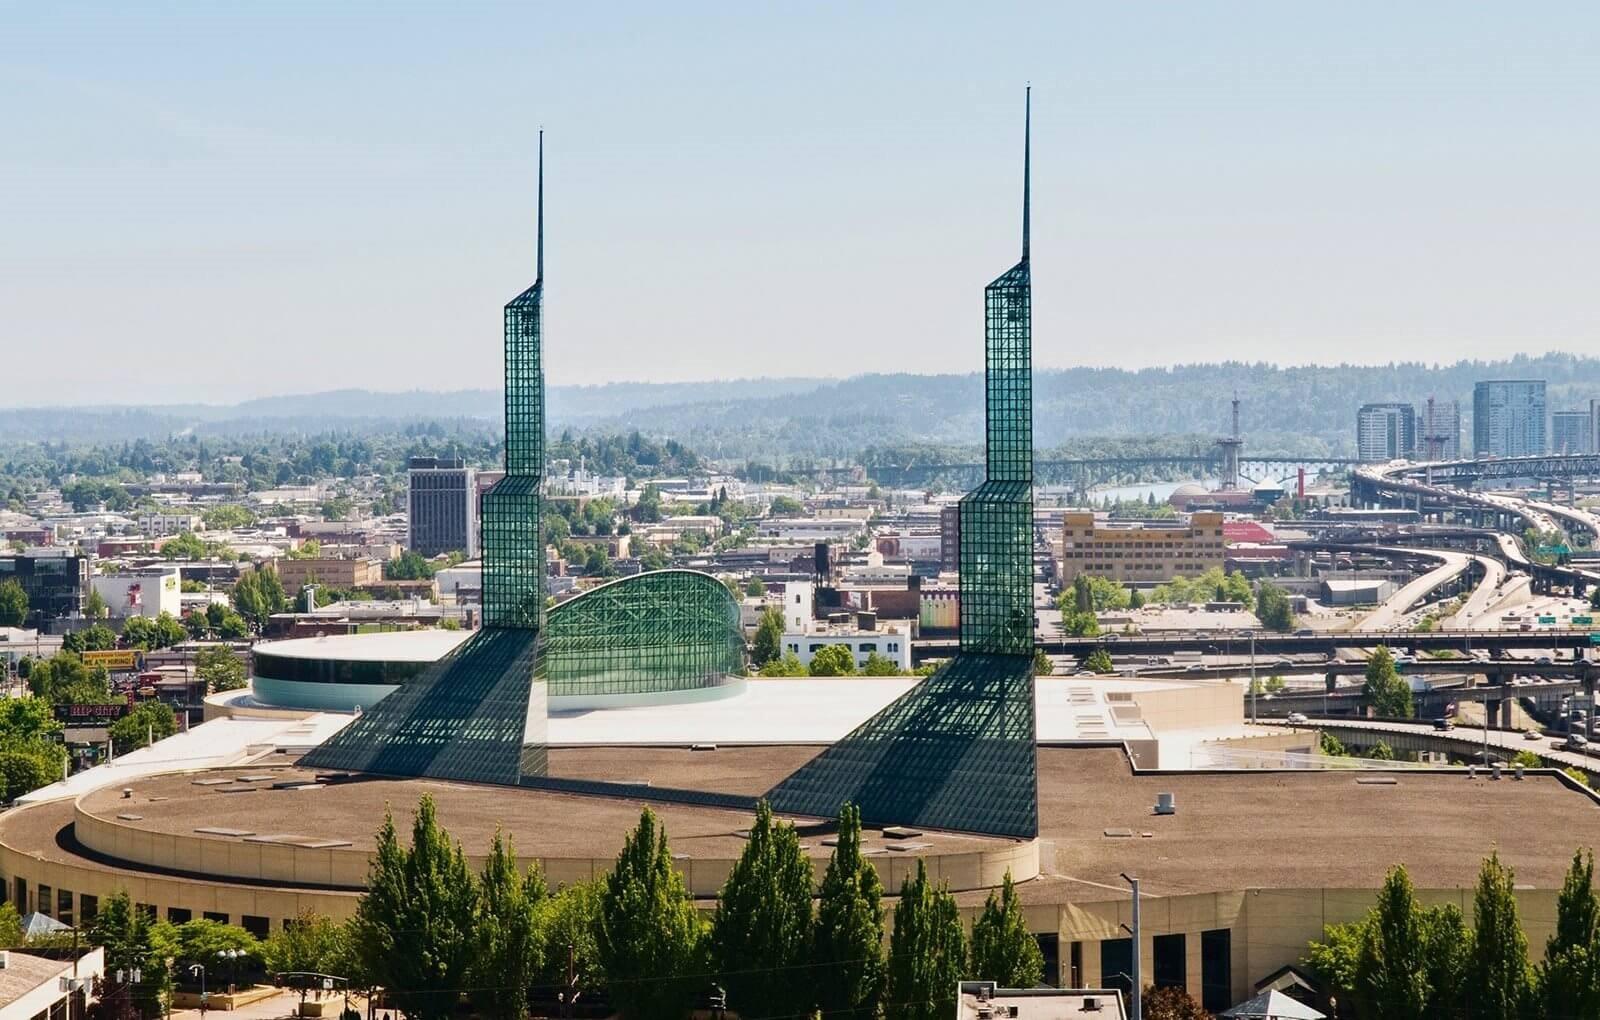 City views of Towers at Pacifica Senior Living Calaroga Terrace, Portland, 97232